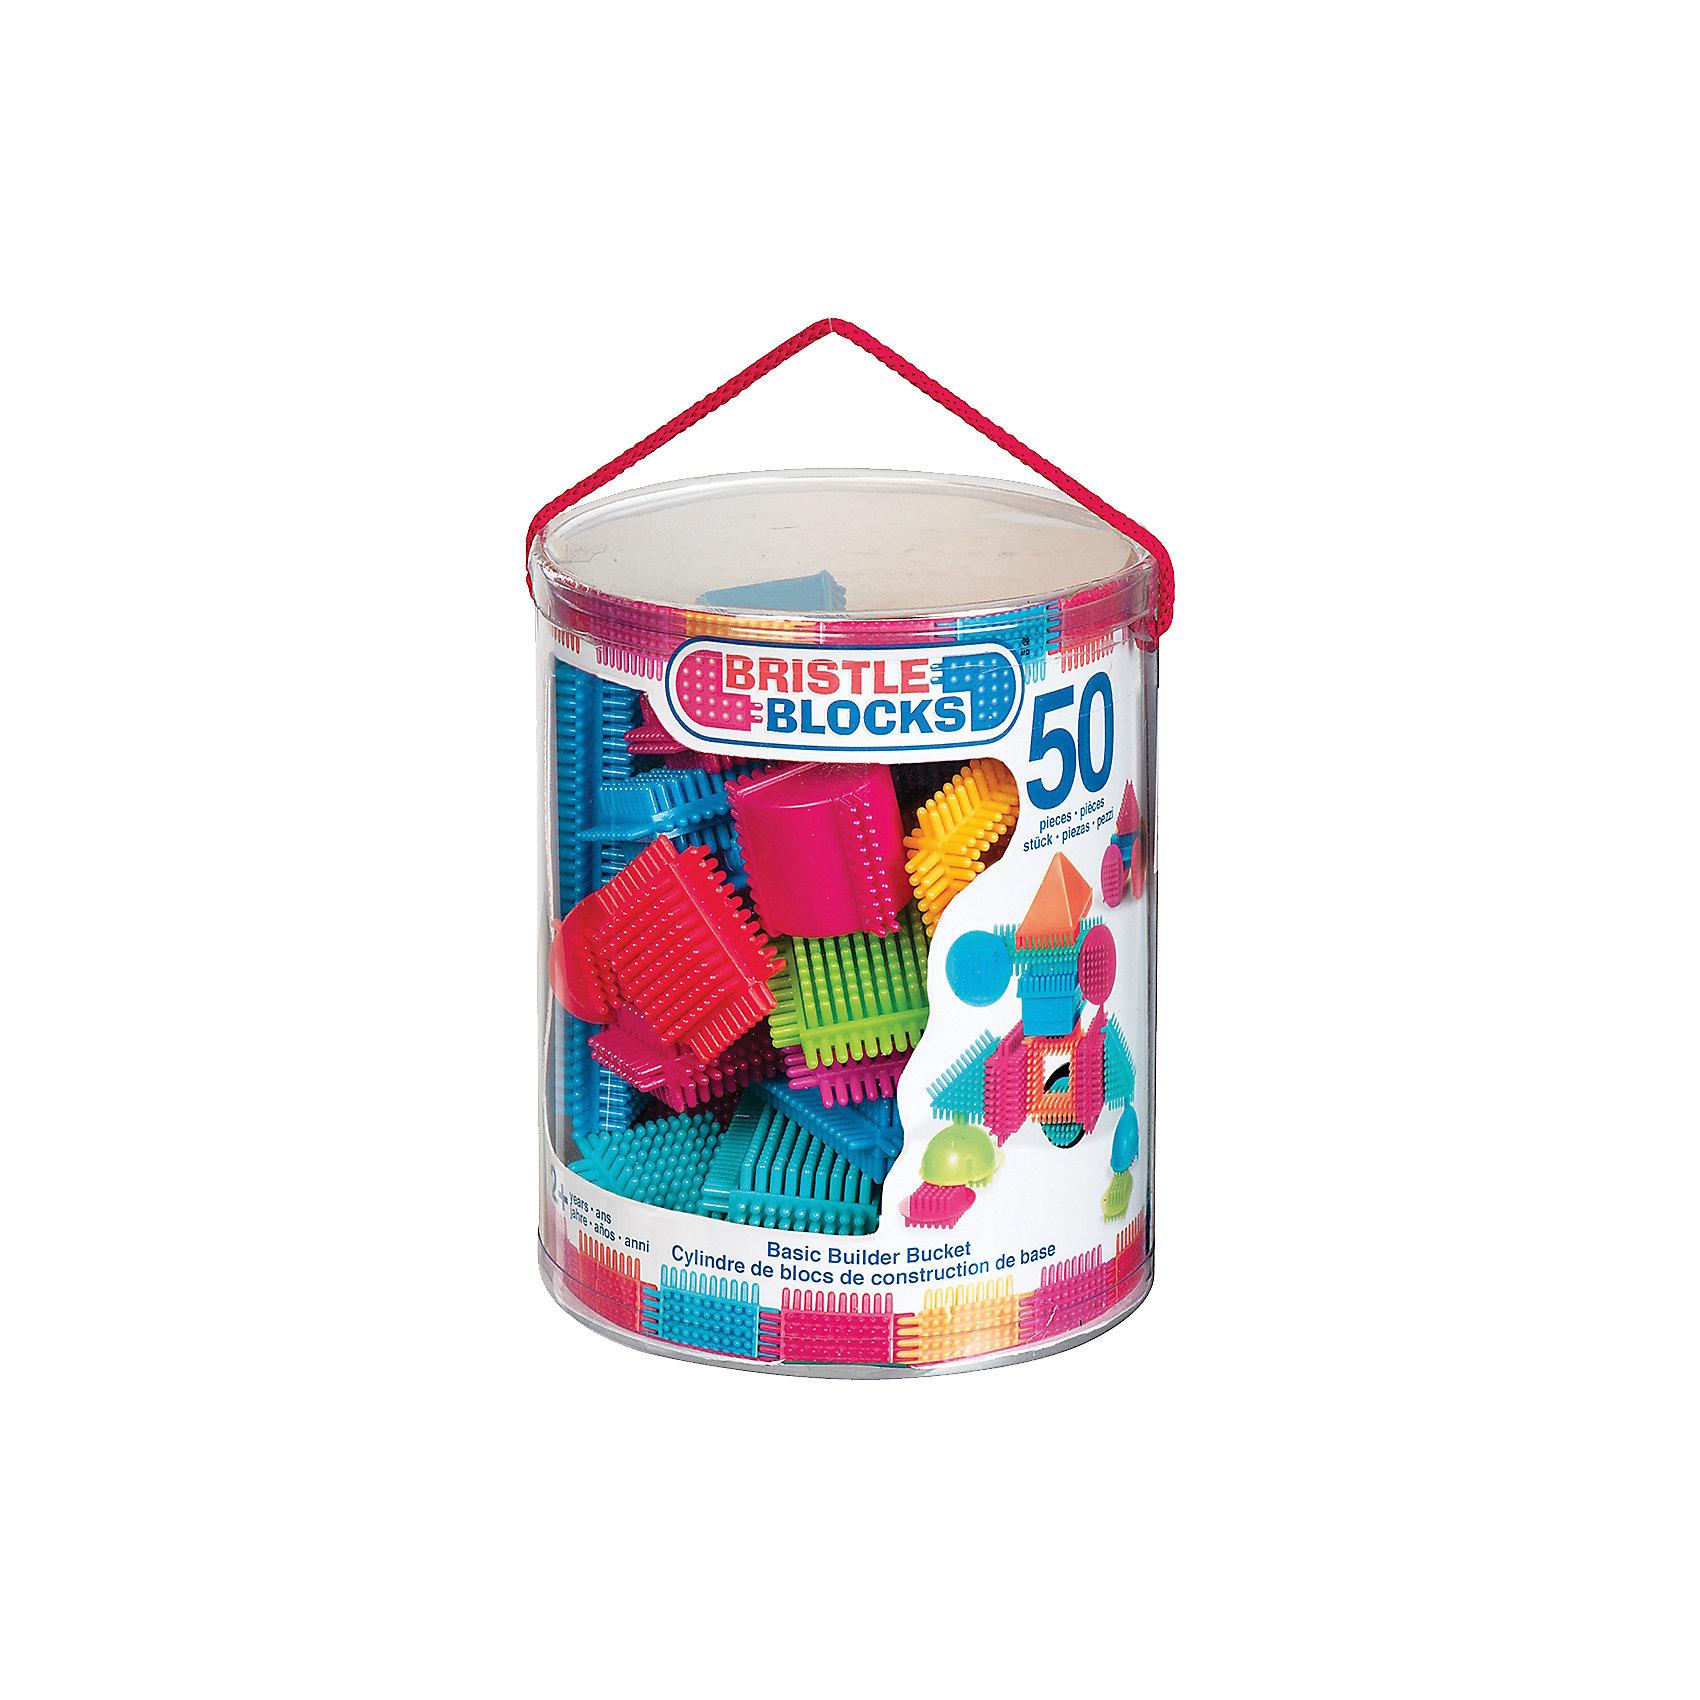 ����������� ���������� � �������, 50 �������, Bristle Blocks (-)